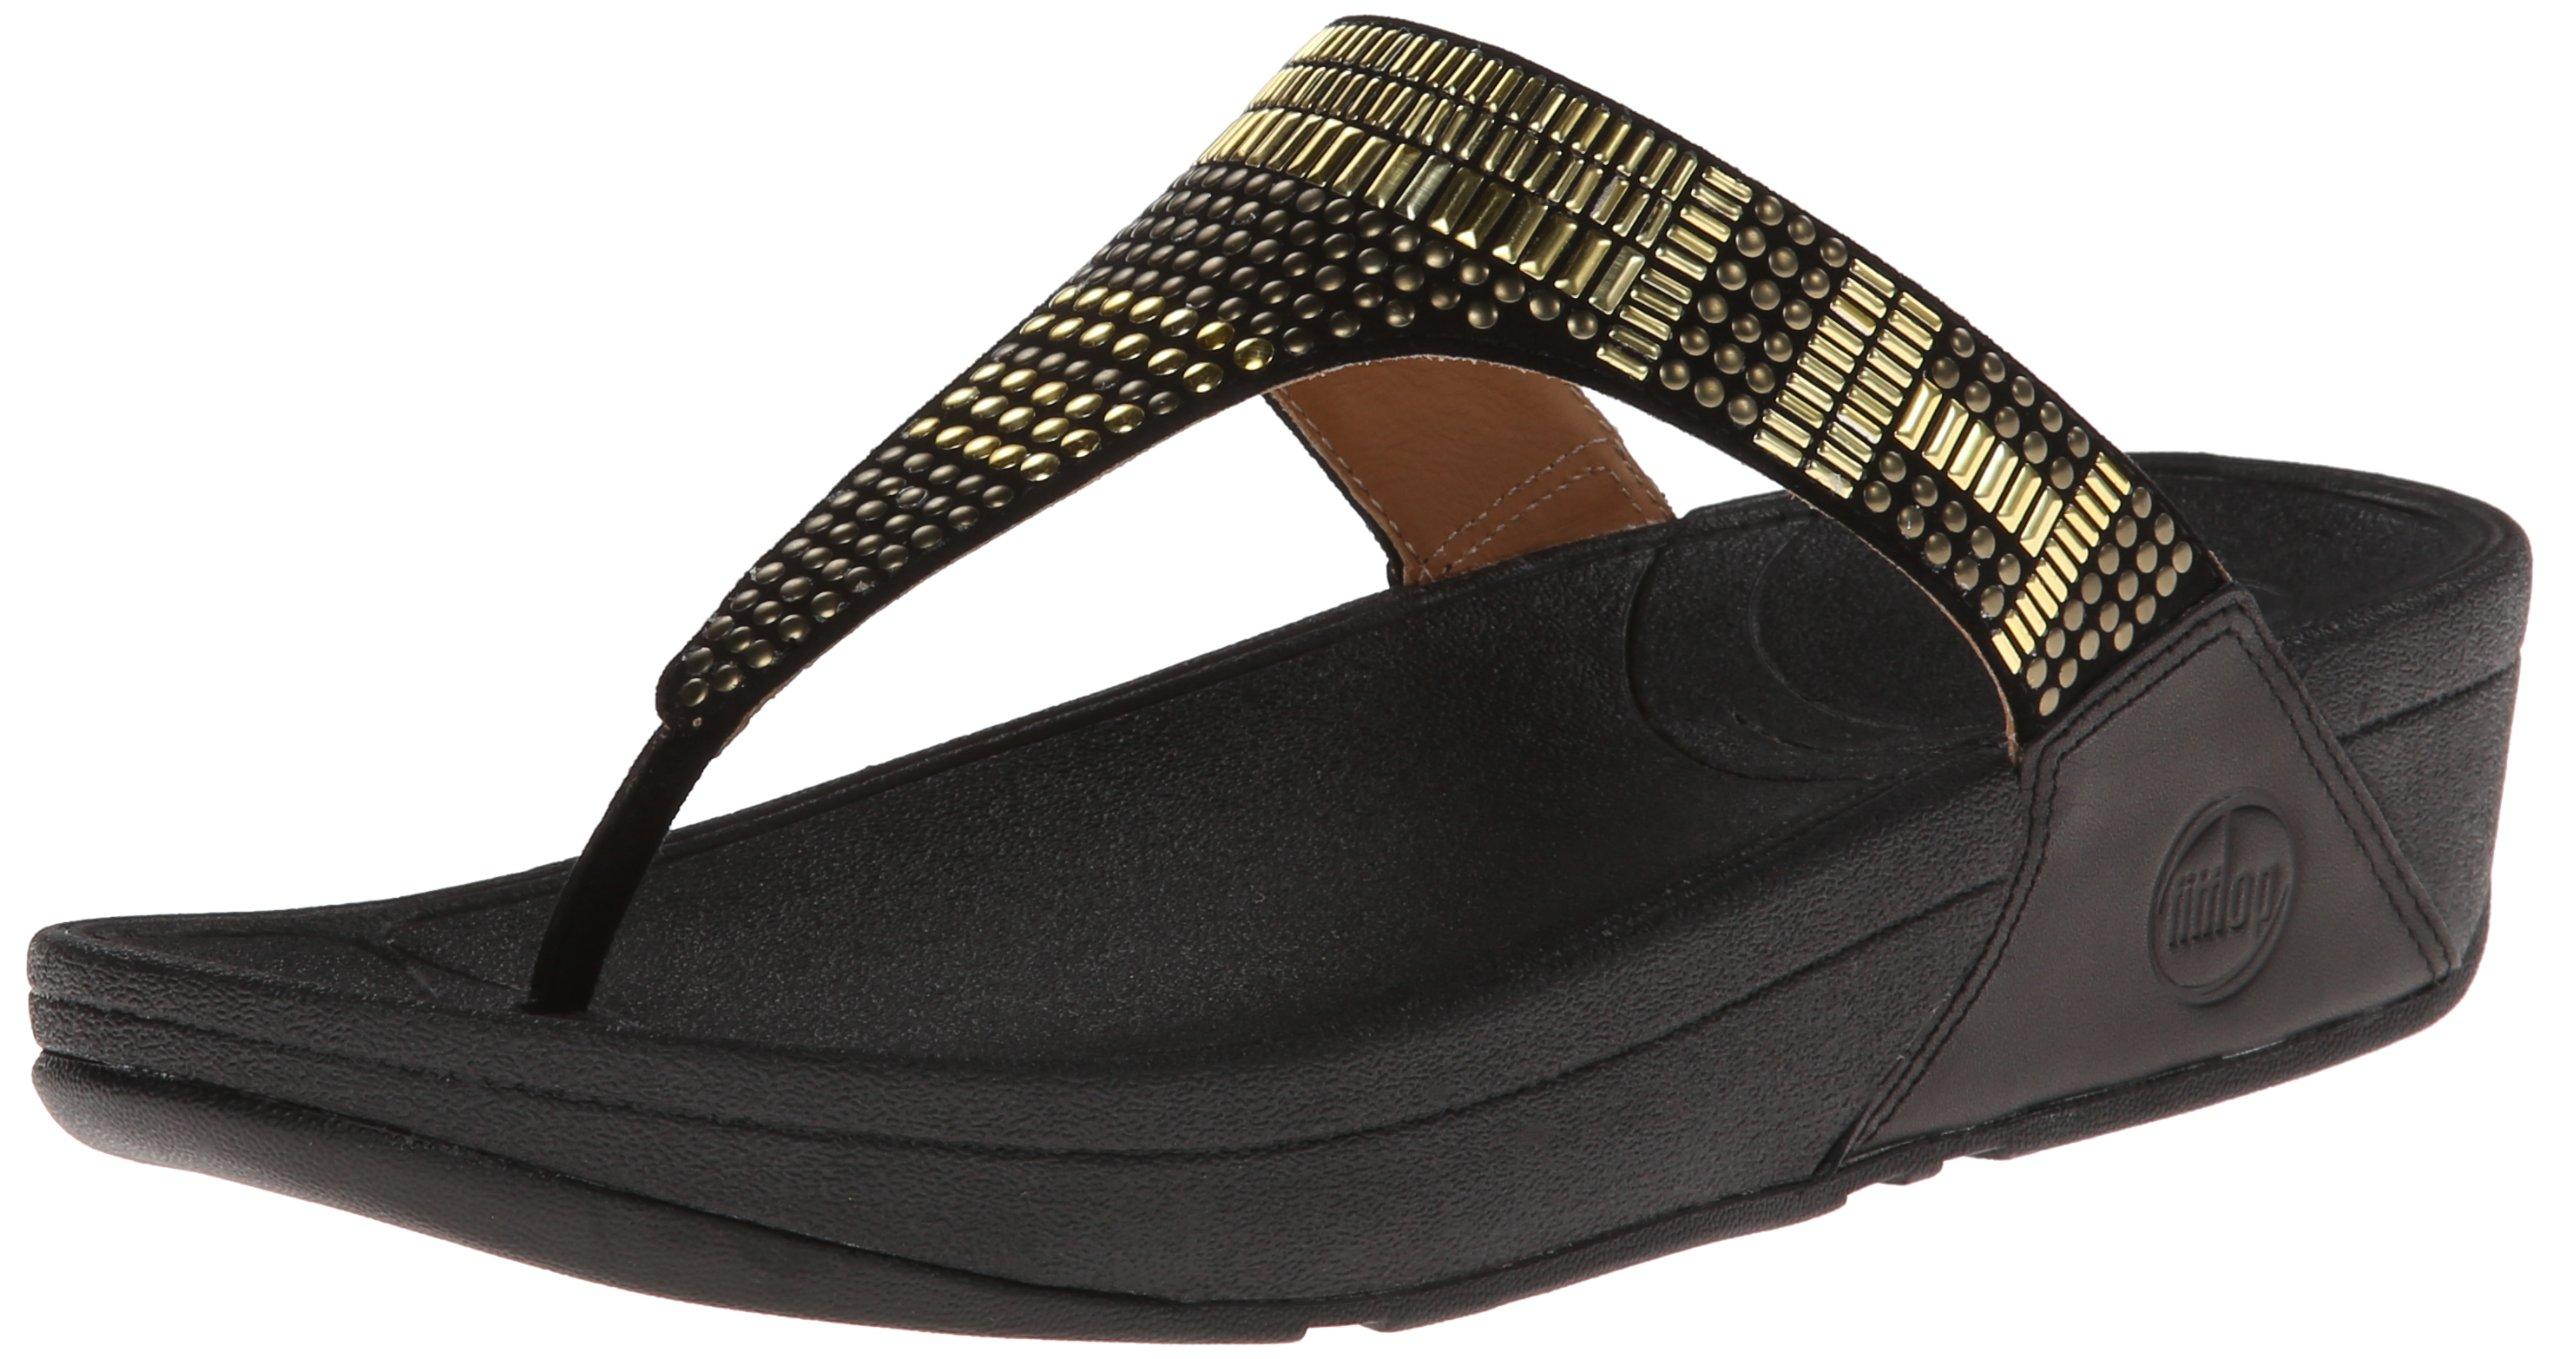 FitFlop Women's Aztec Chada Flip Flop,Black,7 M US